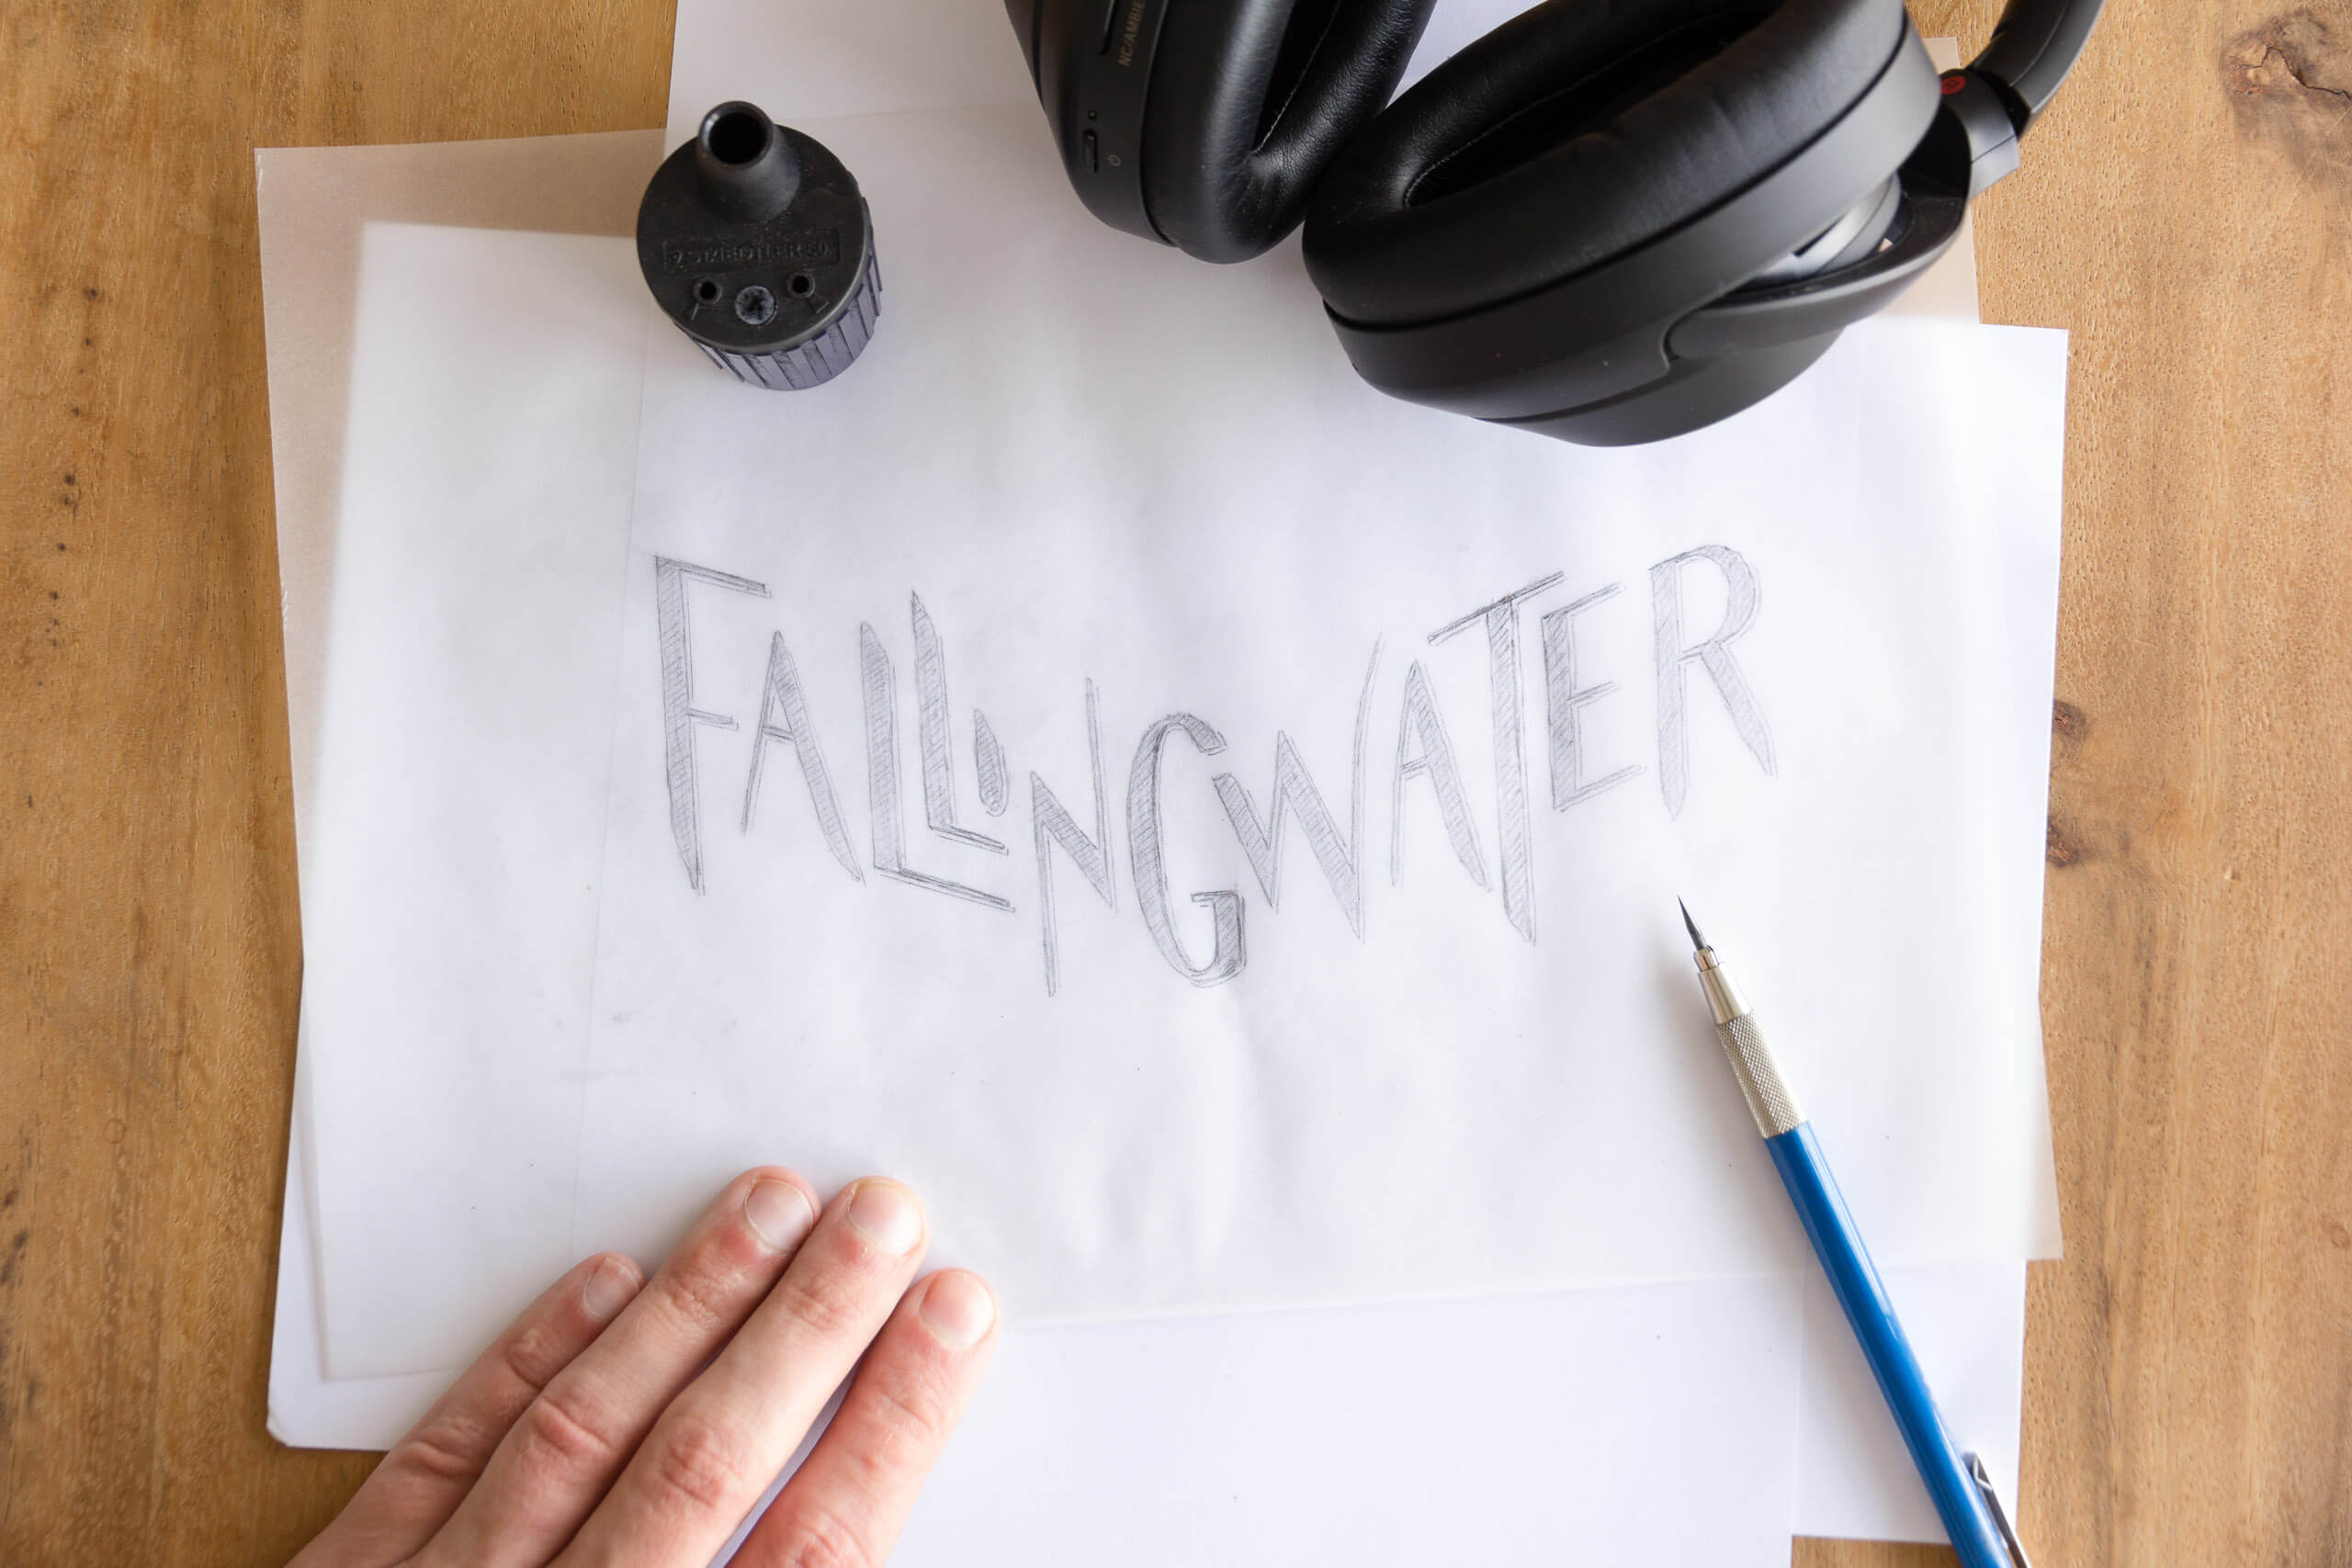 Fallingwater final sketch